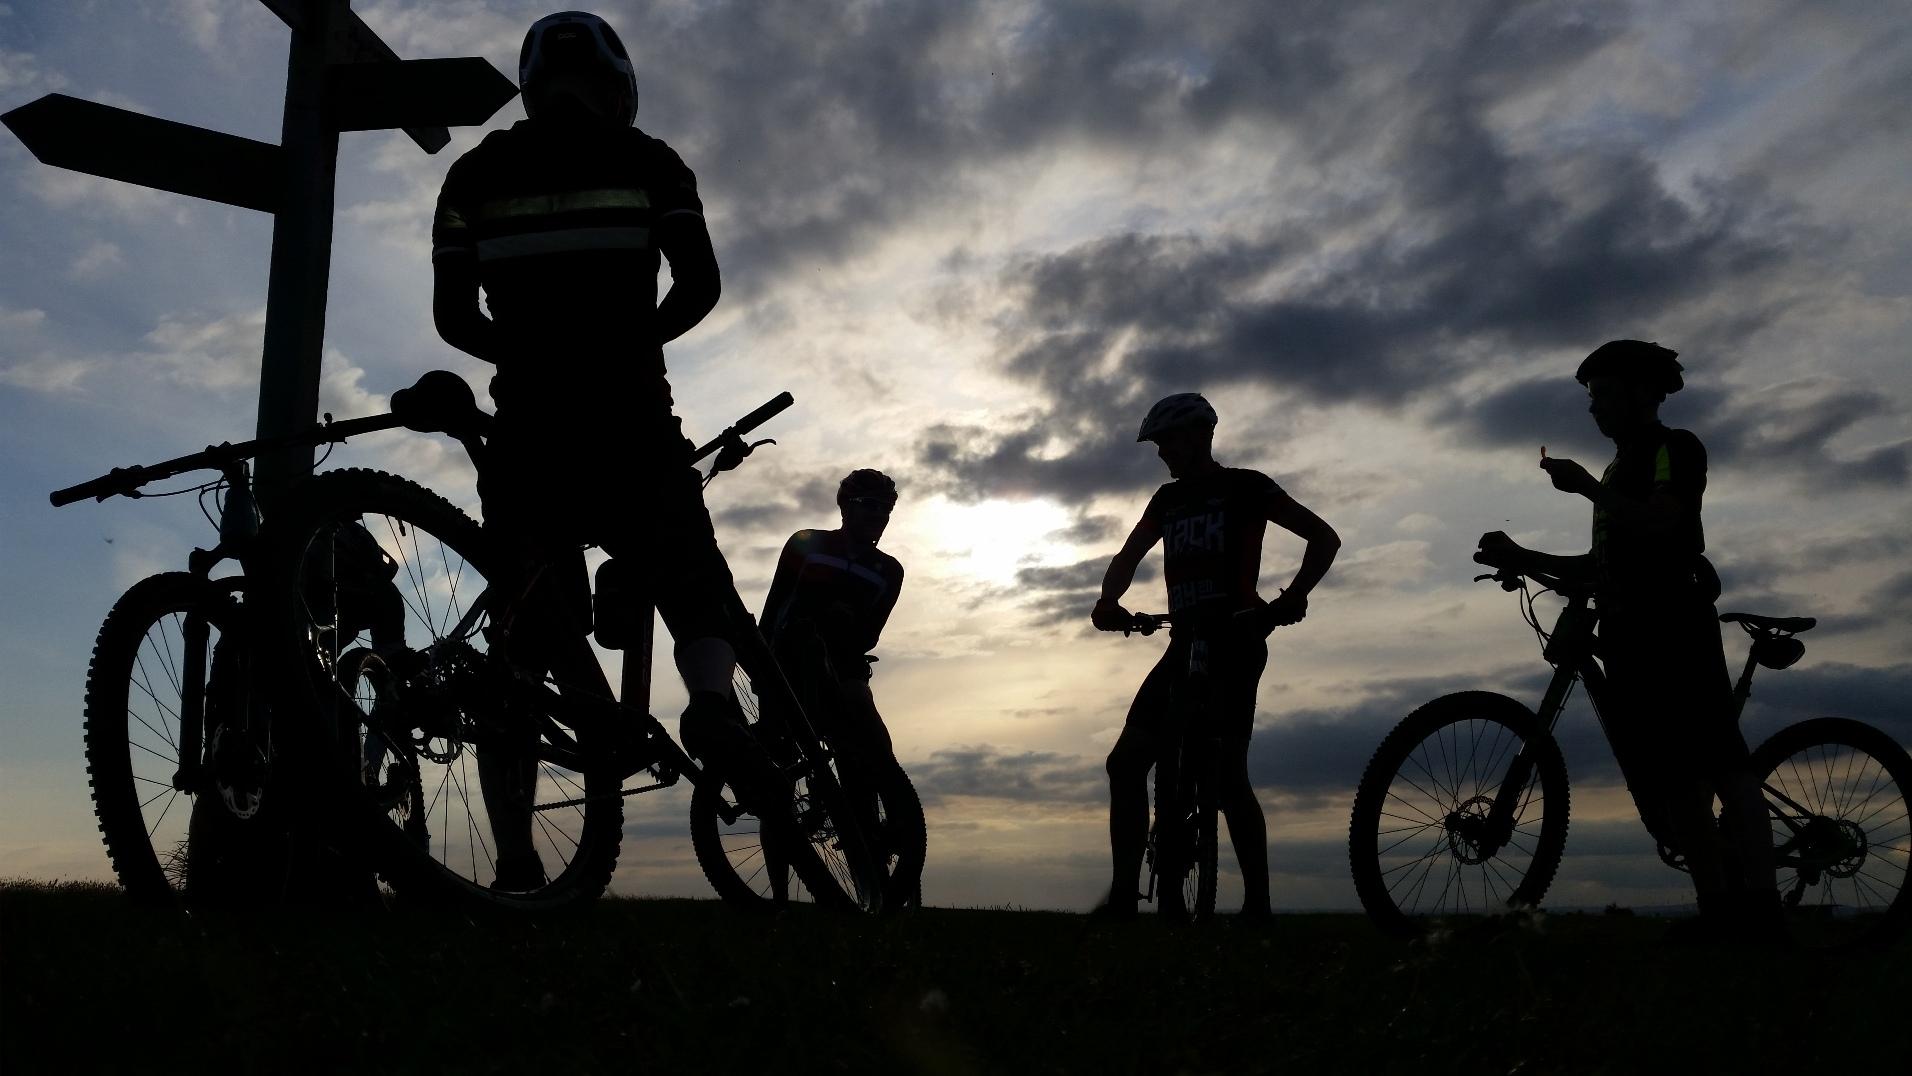 Mountainbiking at Sunset